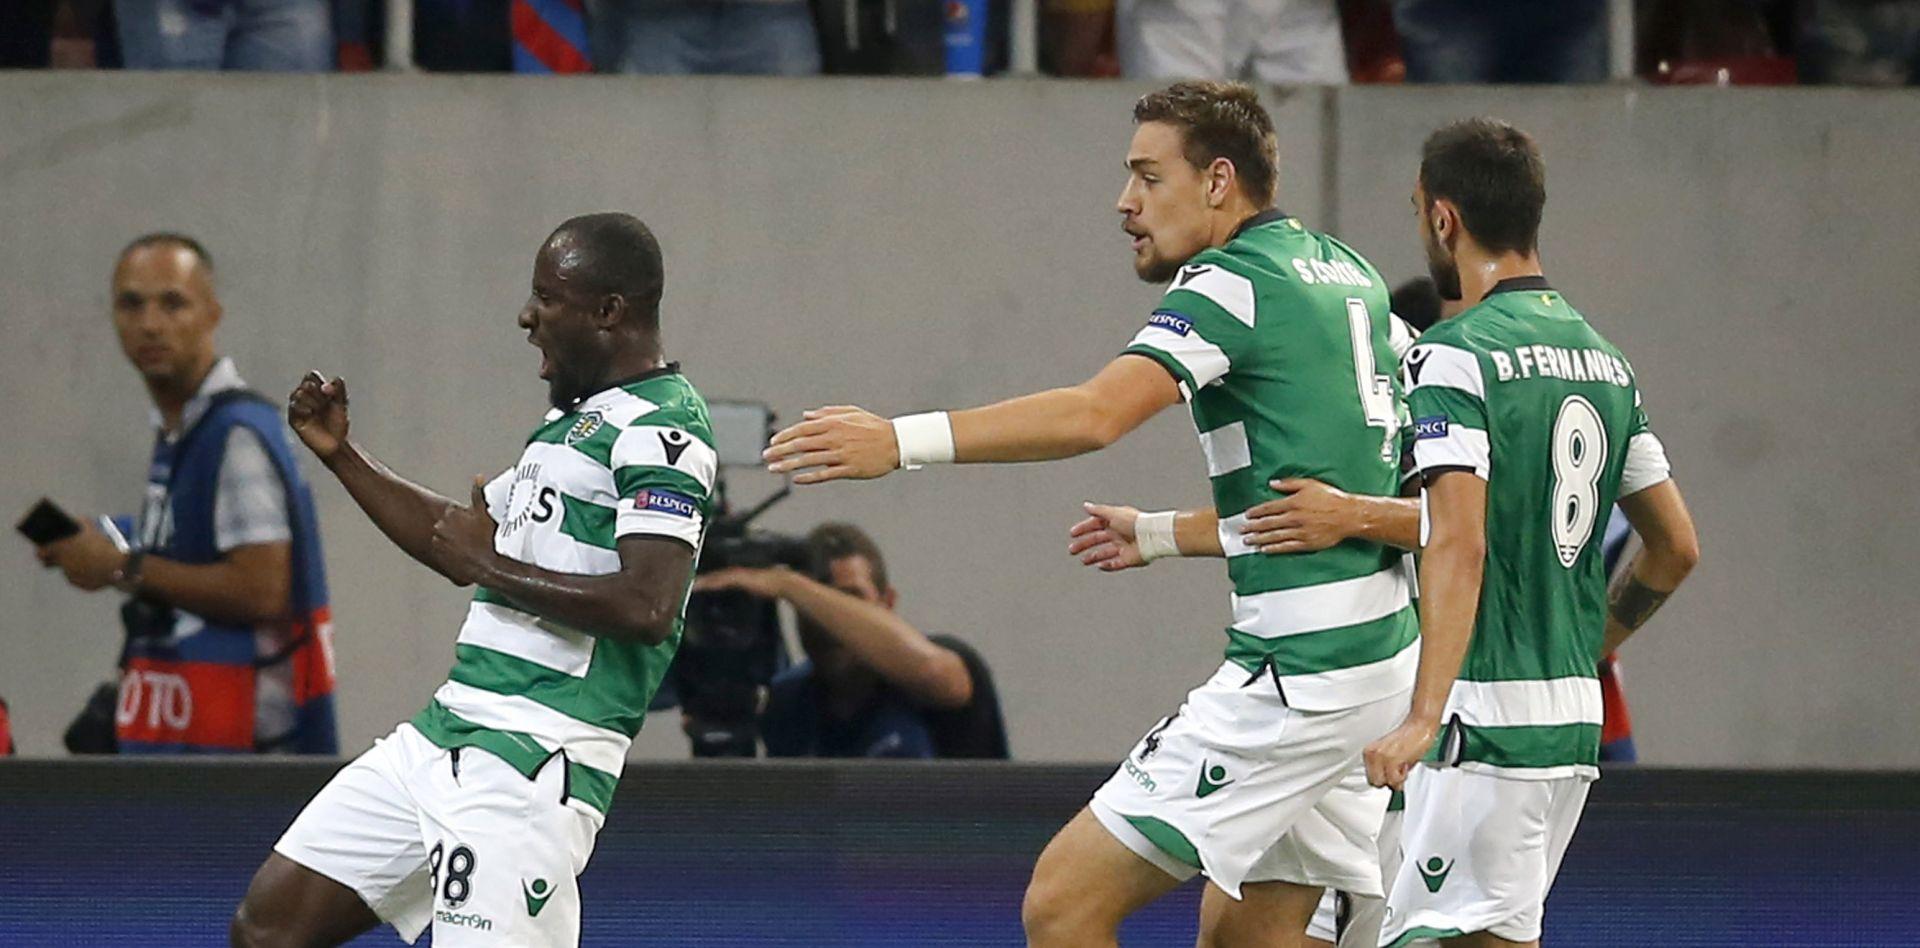 EL – Sporting prošao nakon produžetaka